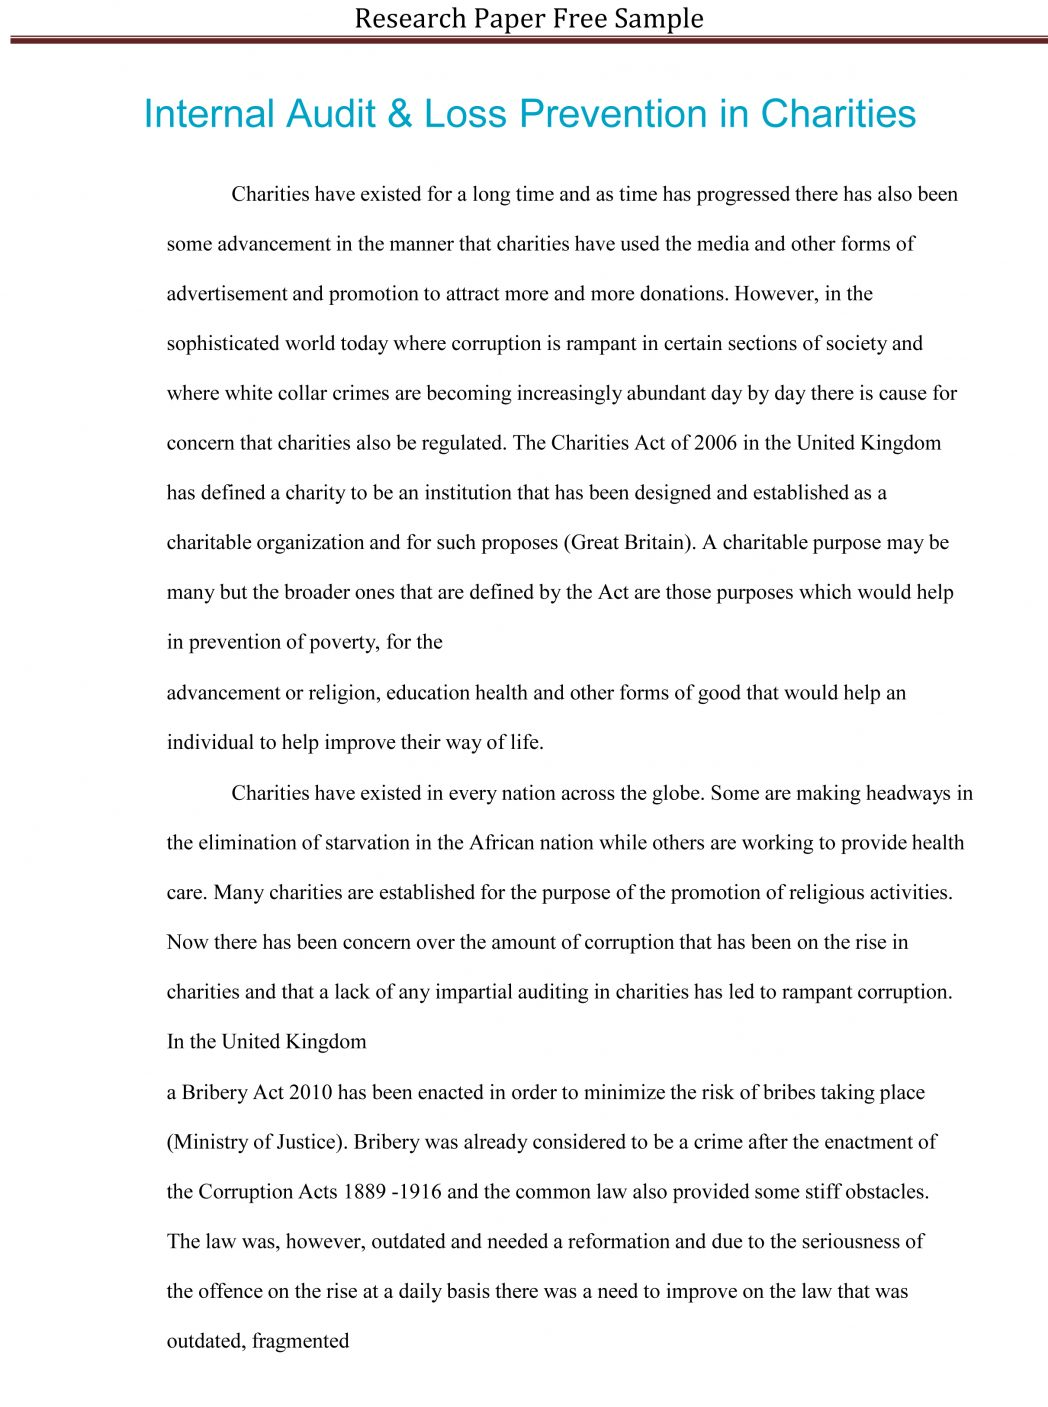 003 Mexican Essays High School Entrance Photo Essay Paragraph Joke Cheap Ghostwriters Ser 1048x1407 Impressive Full